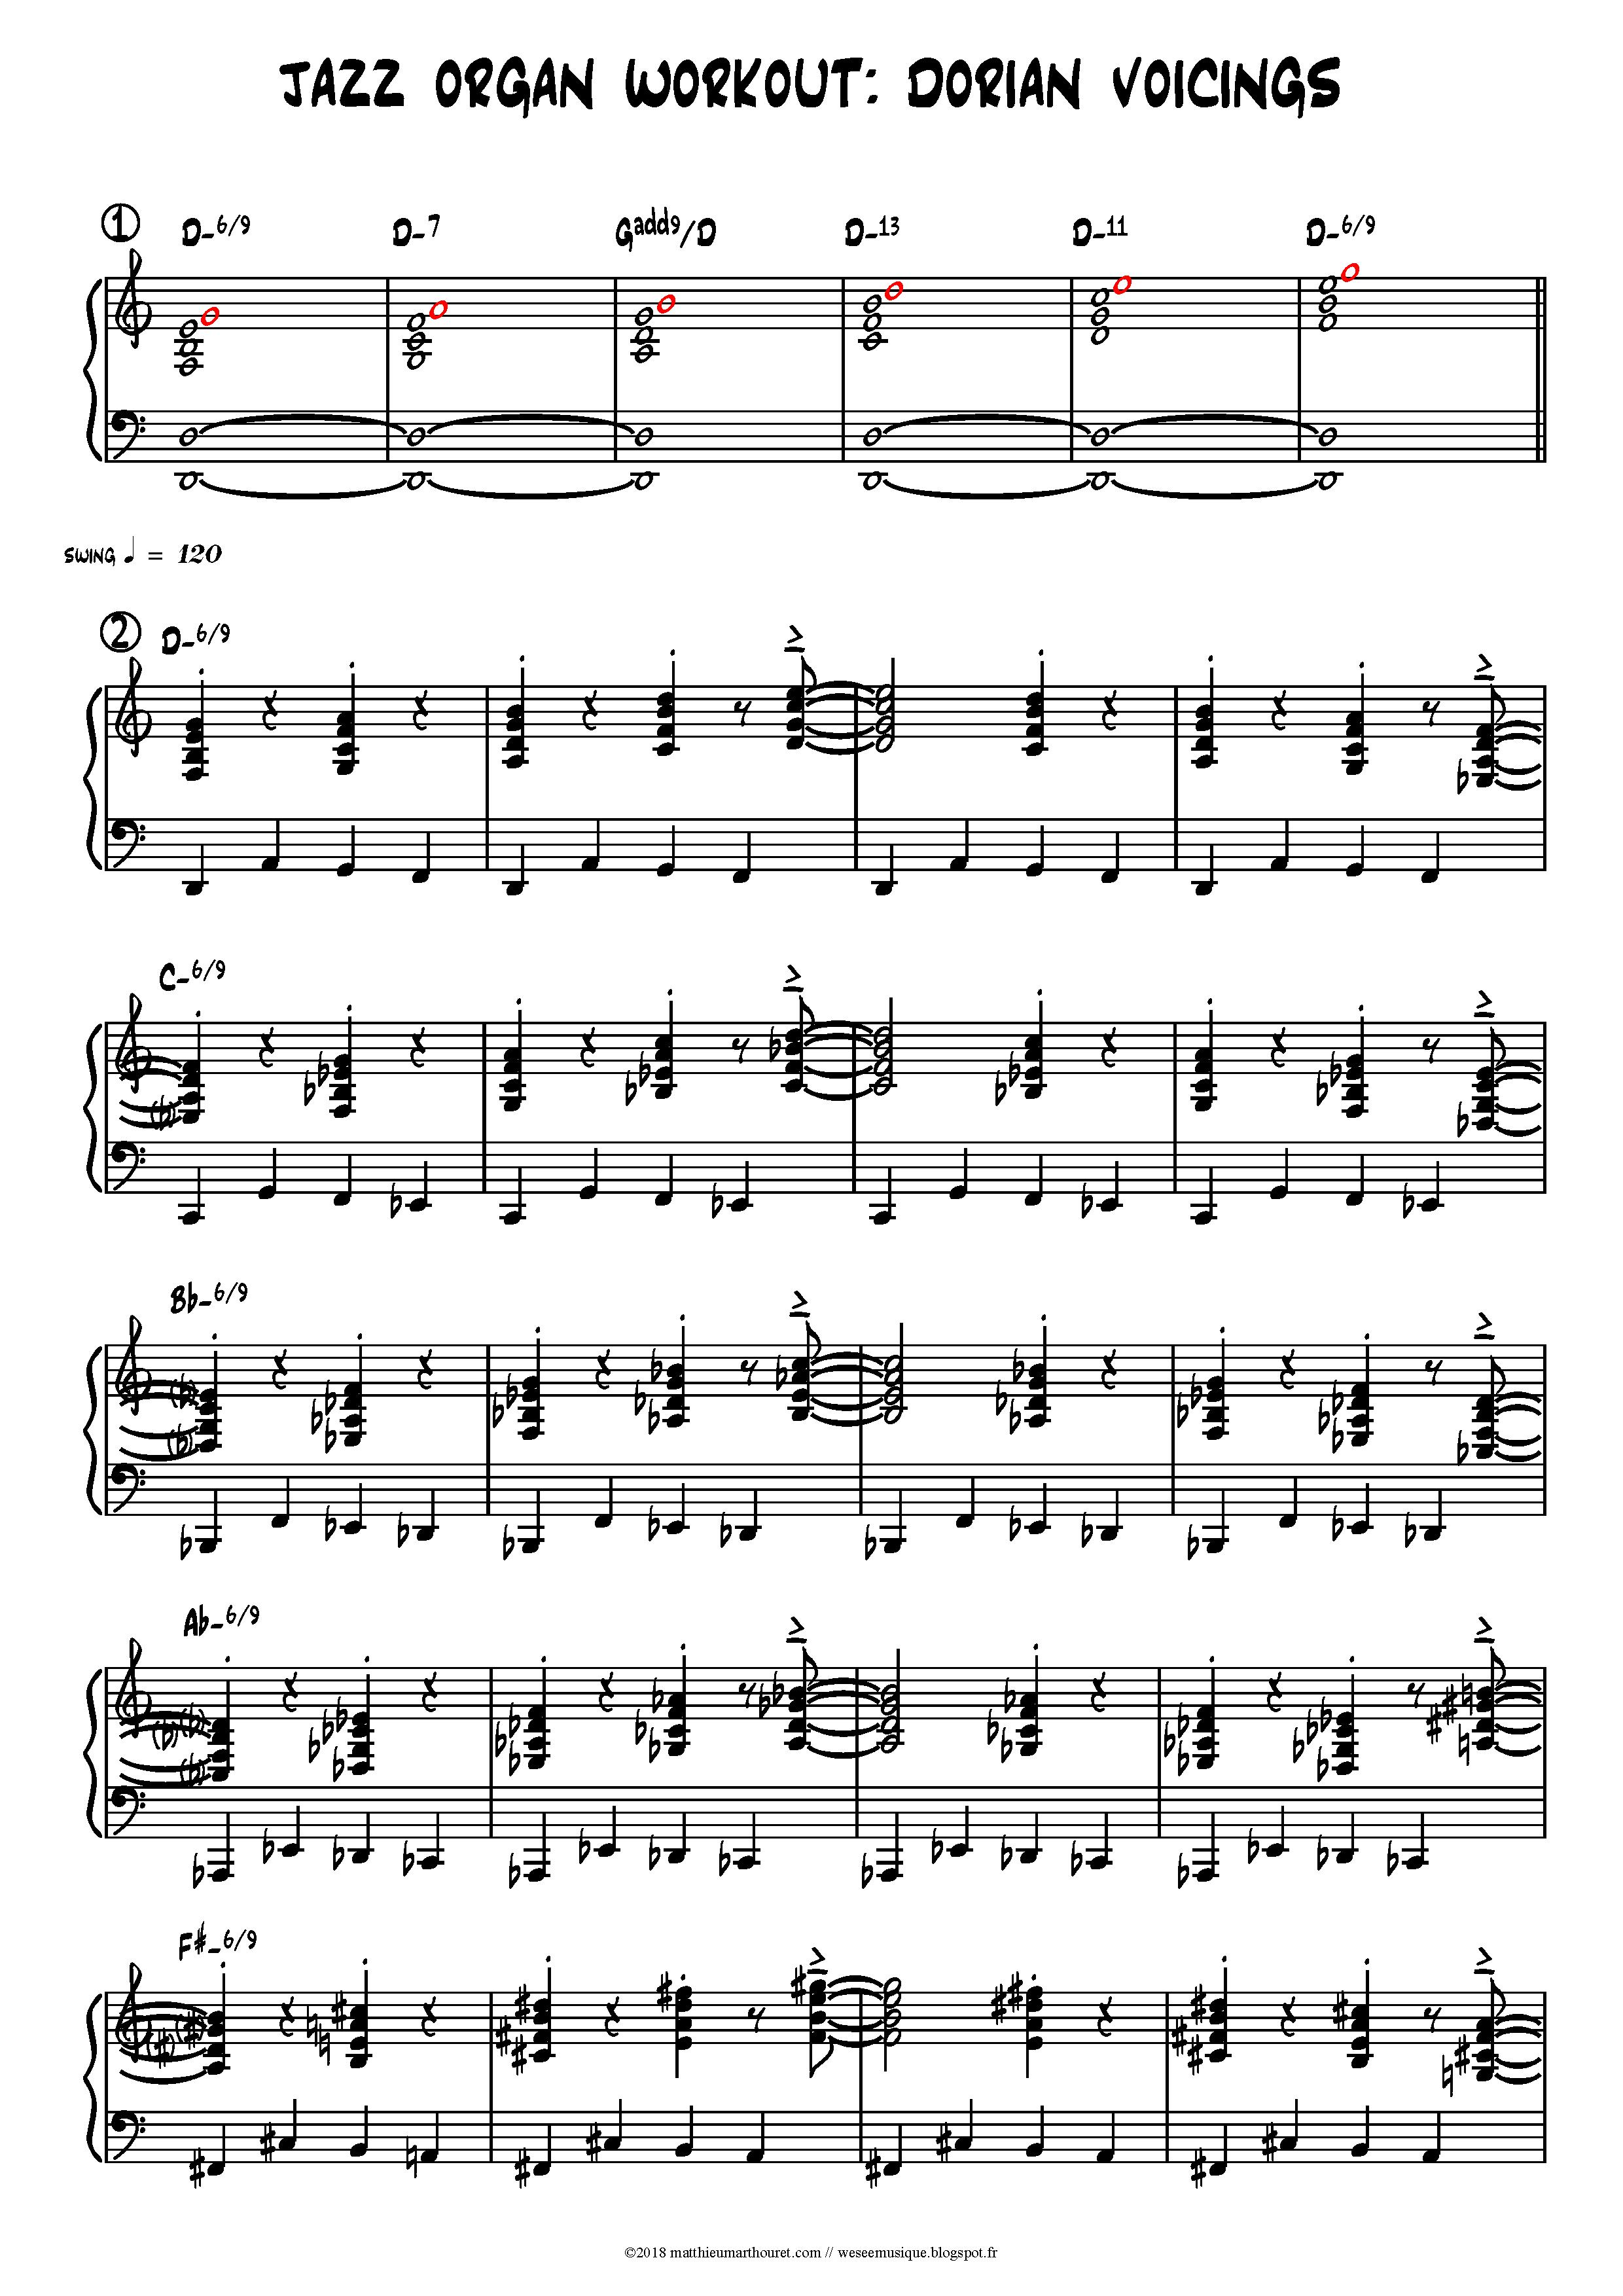 jazz organ workout dorian voicings 1